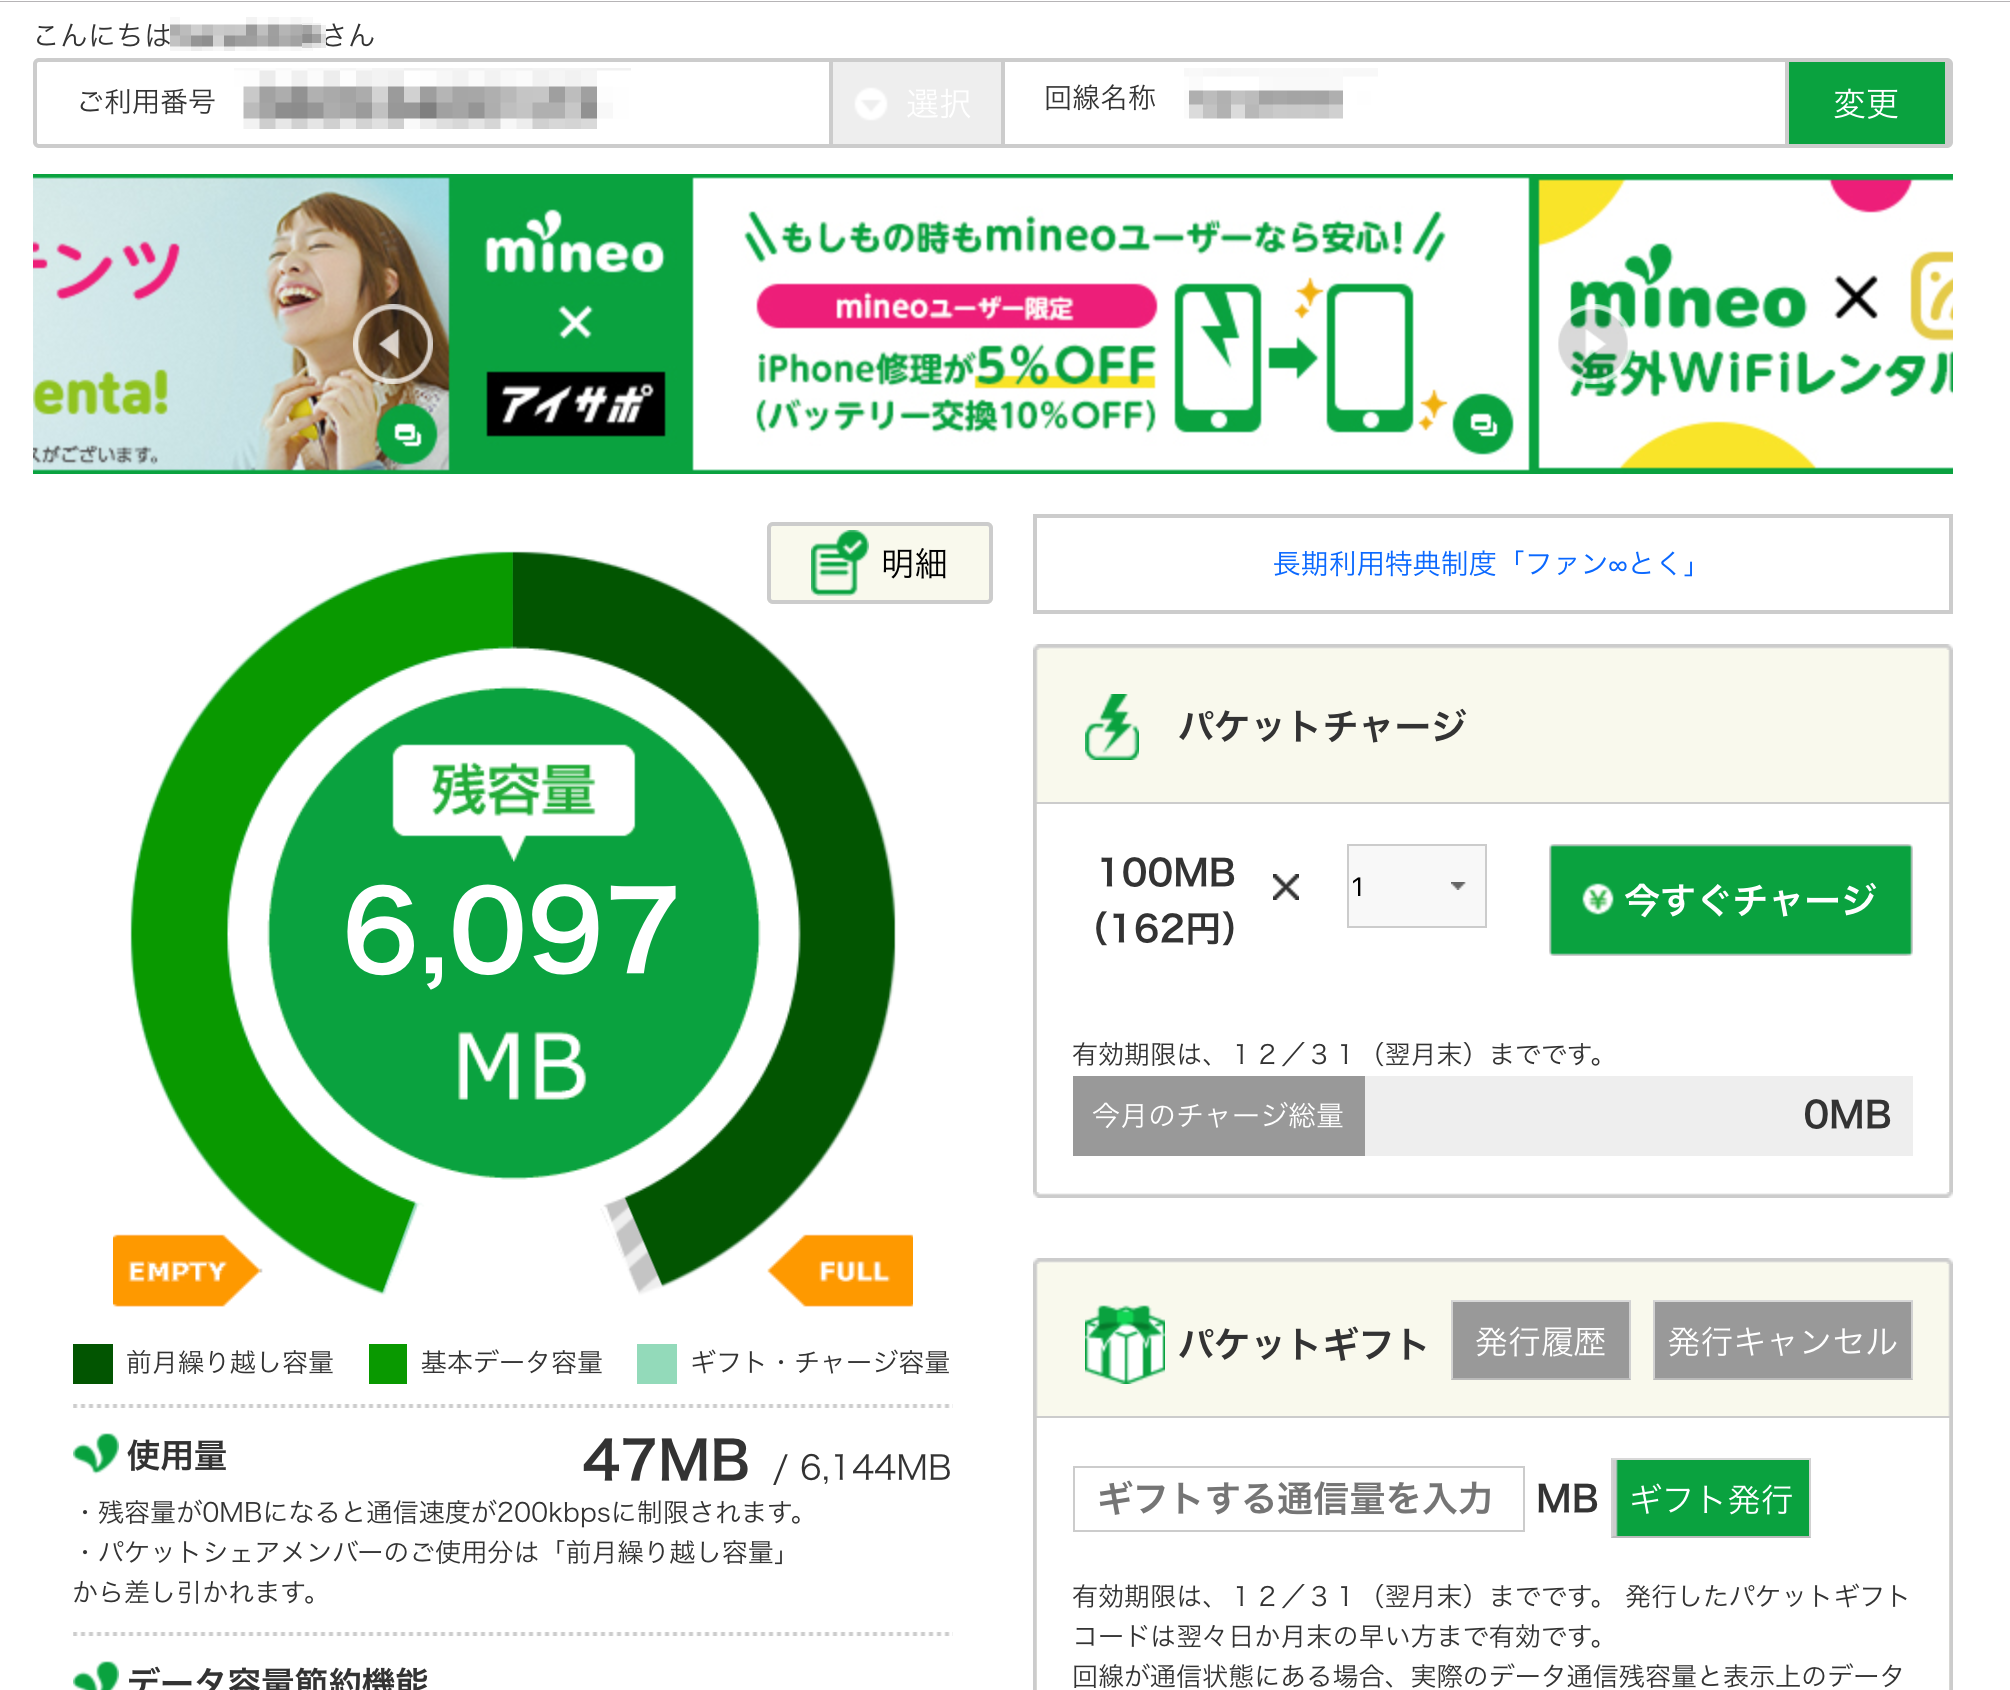 mineoの通信の最適化の解除方法